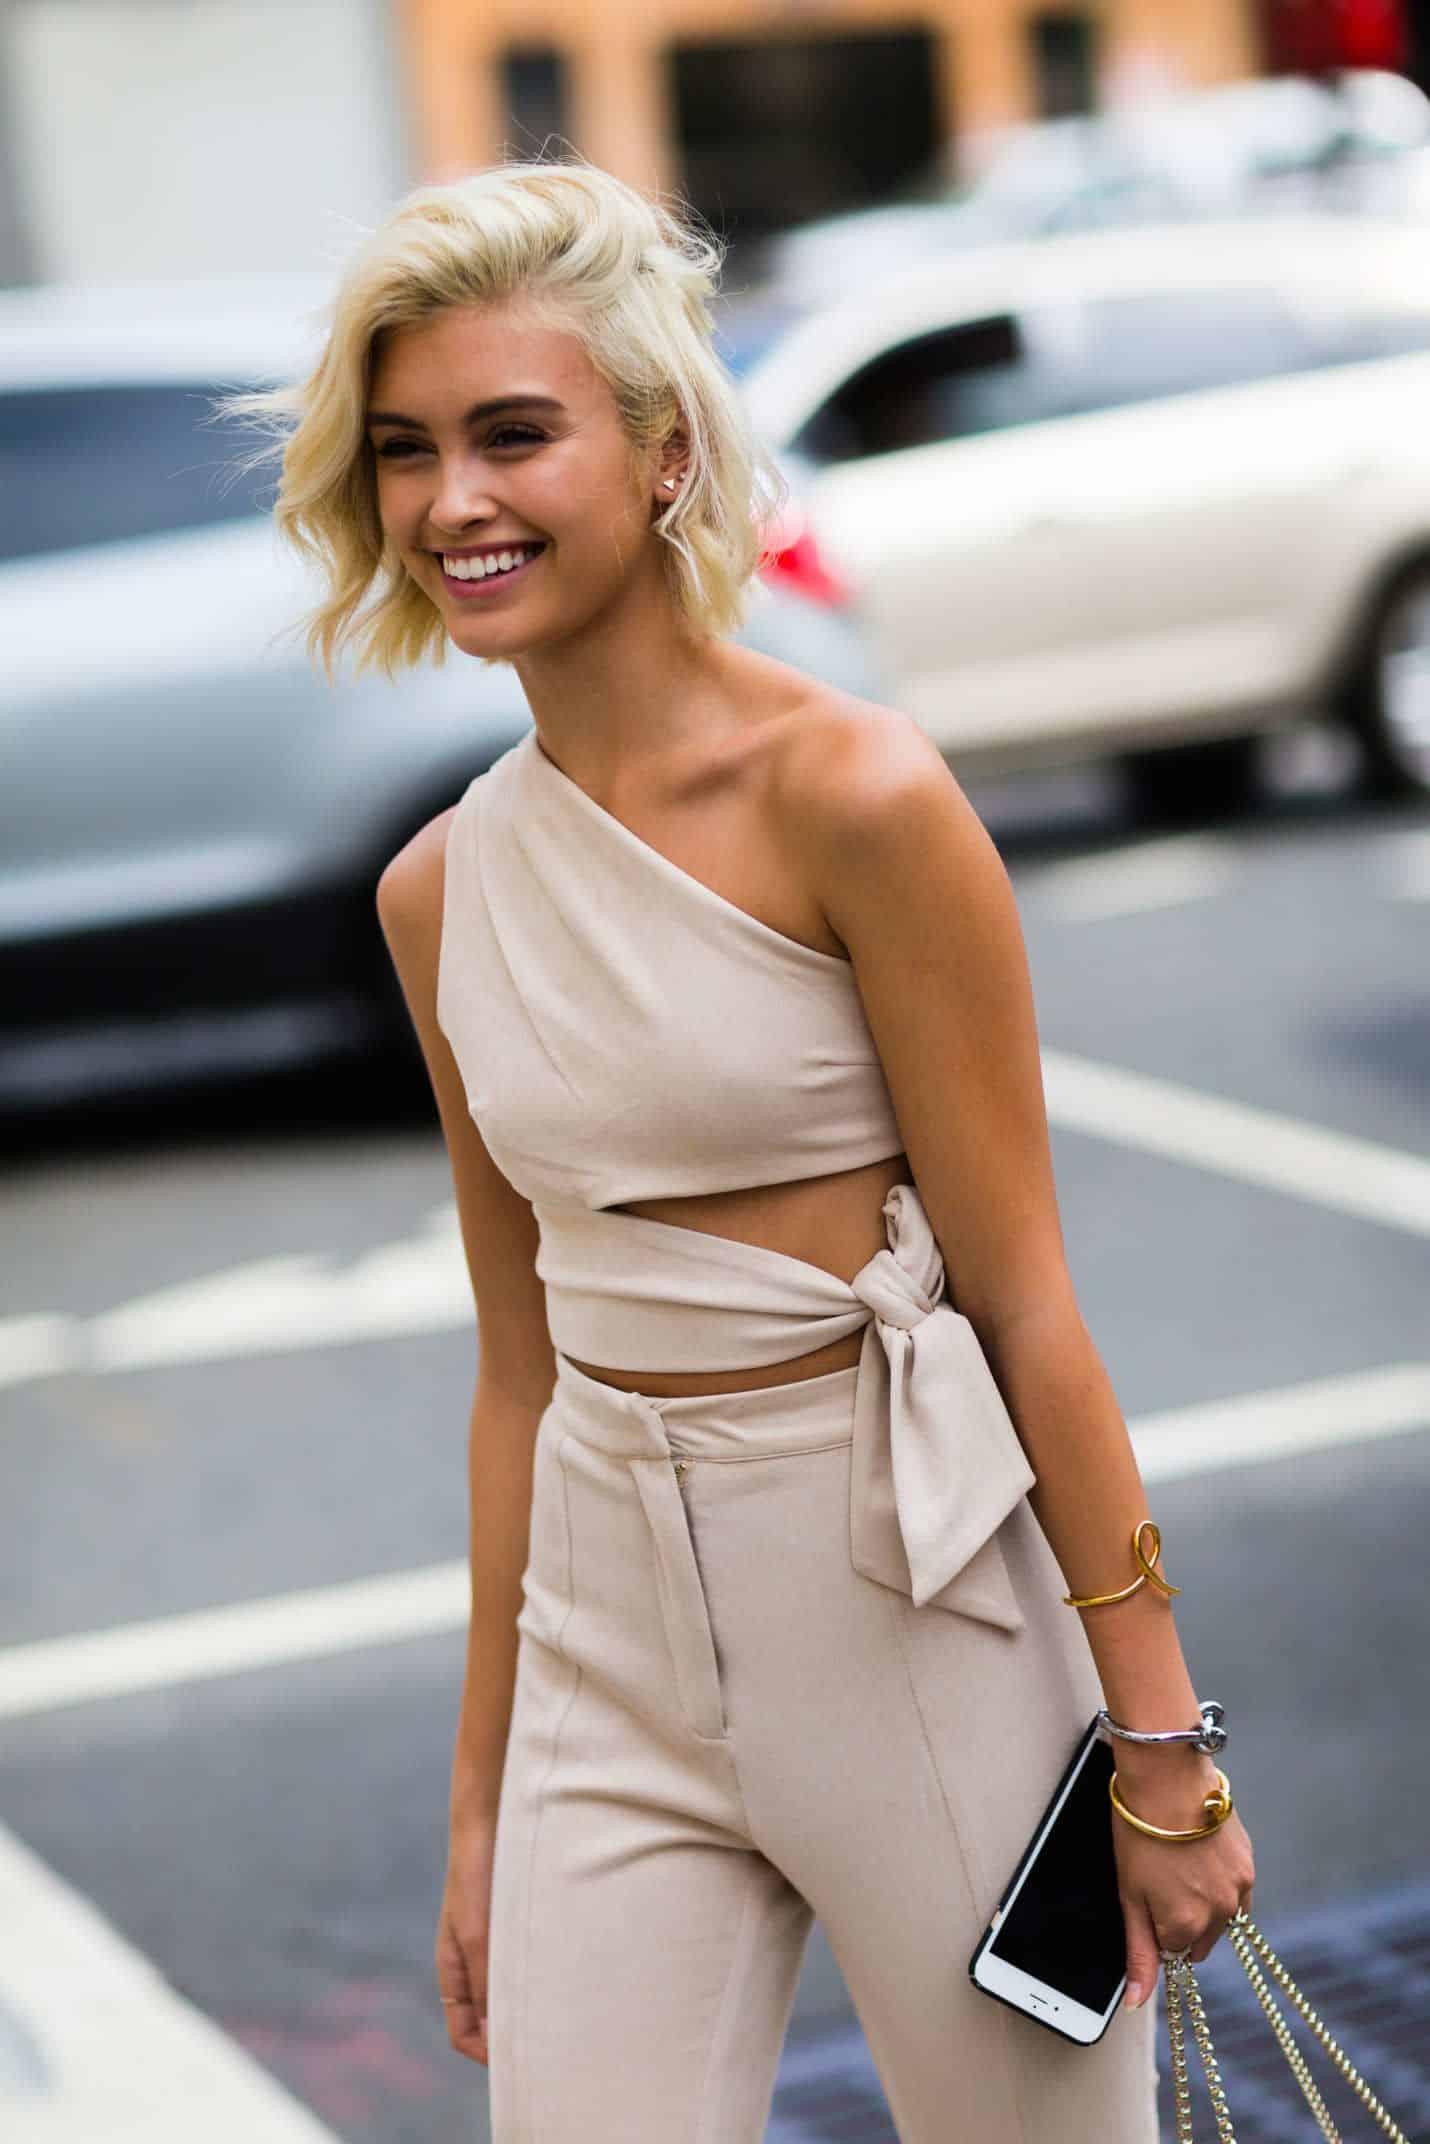 Sarah Ellen Australian Actress and Model